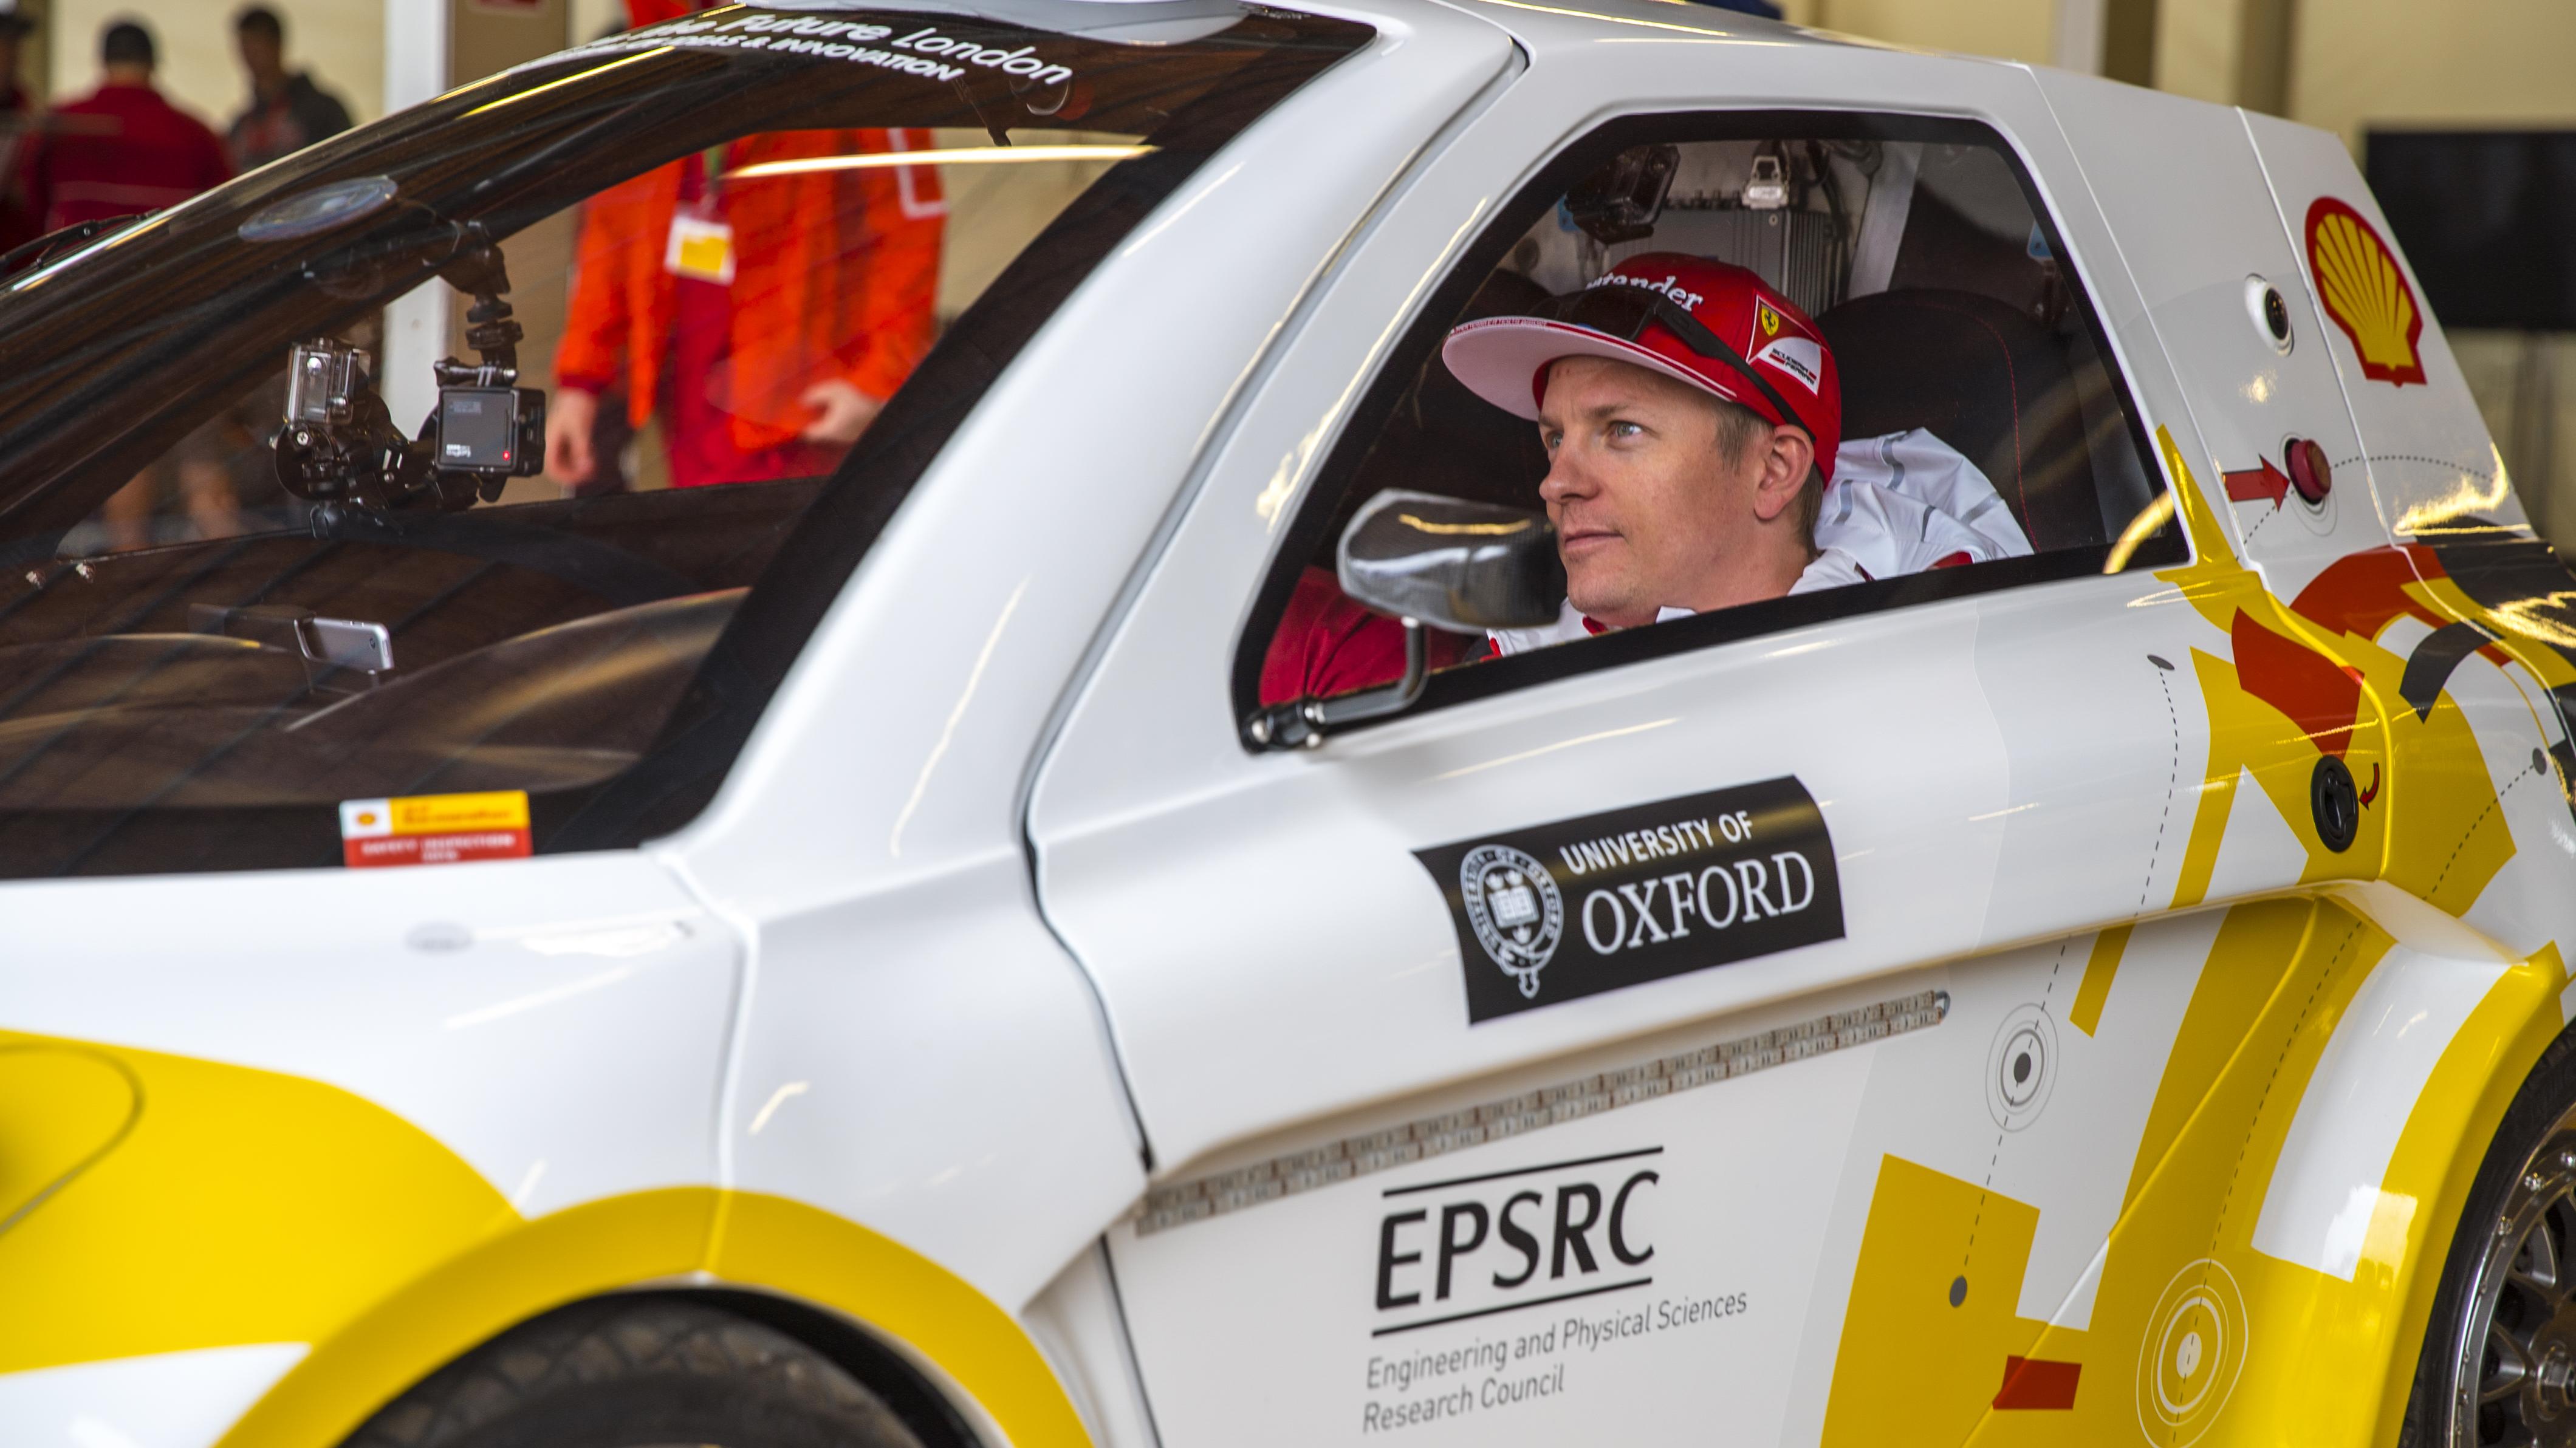 Oxford's autonomous vehicle technology showcased at Shell Eco-marathon